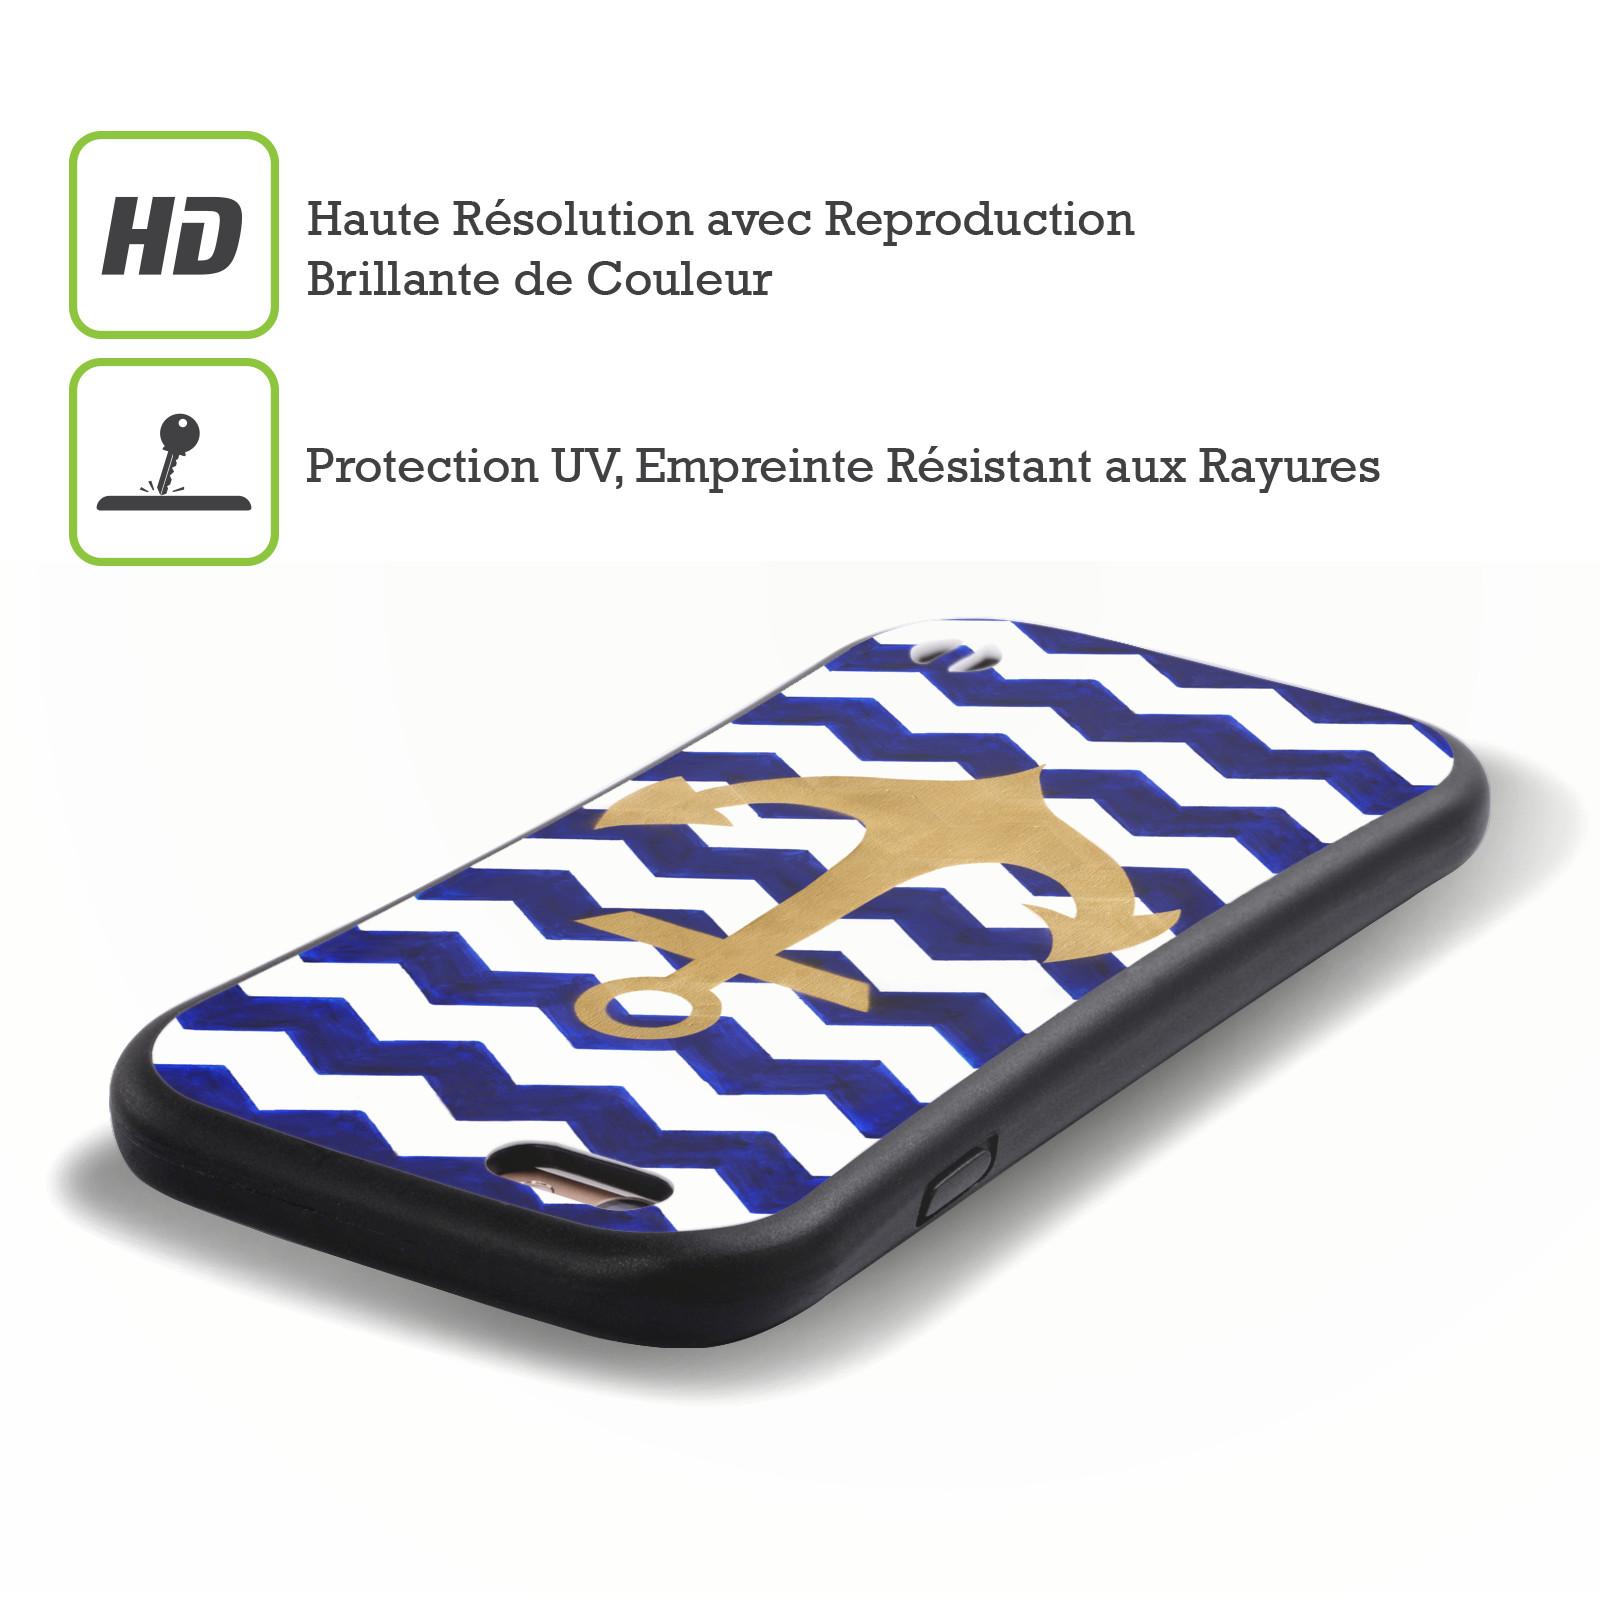 OFFICIEL-ARTPOPTART-CHEVRON-ETUI-COQUE-HYBRIDE-POUR-APPLE-iPHONES-TELEPHONES